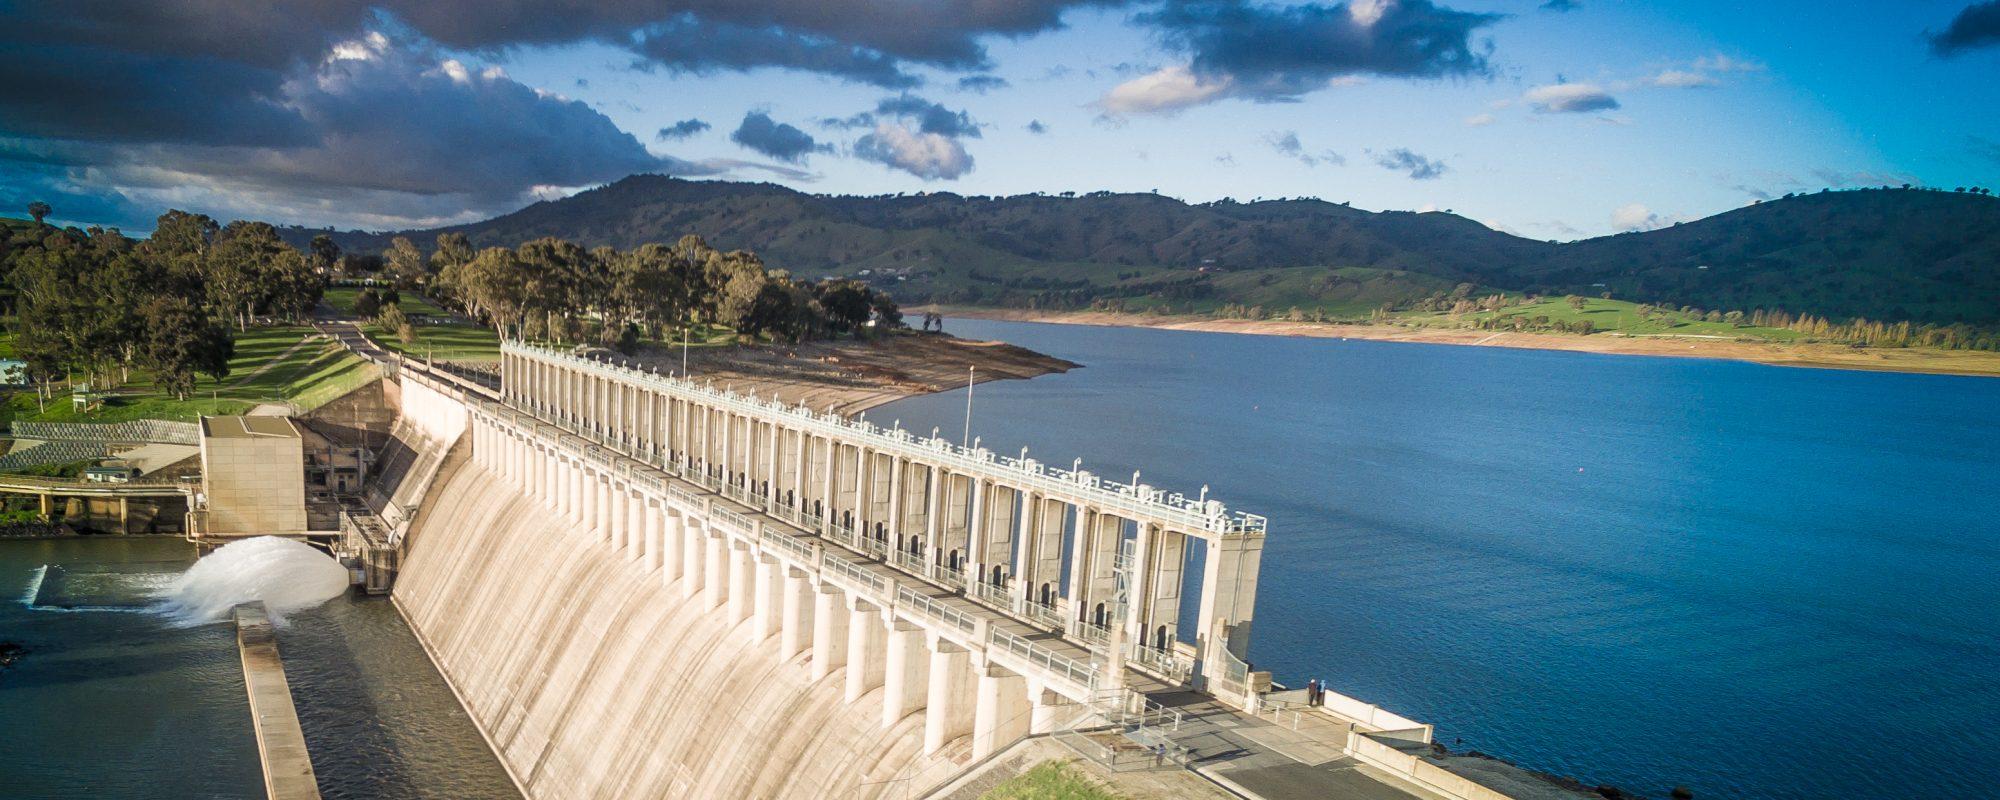 The Hume Dam on Lake Hume